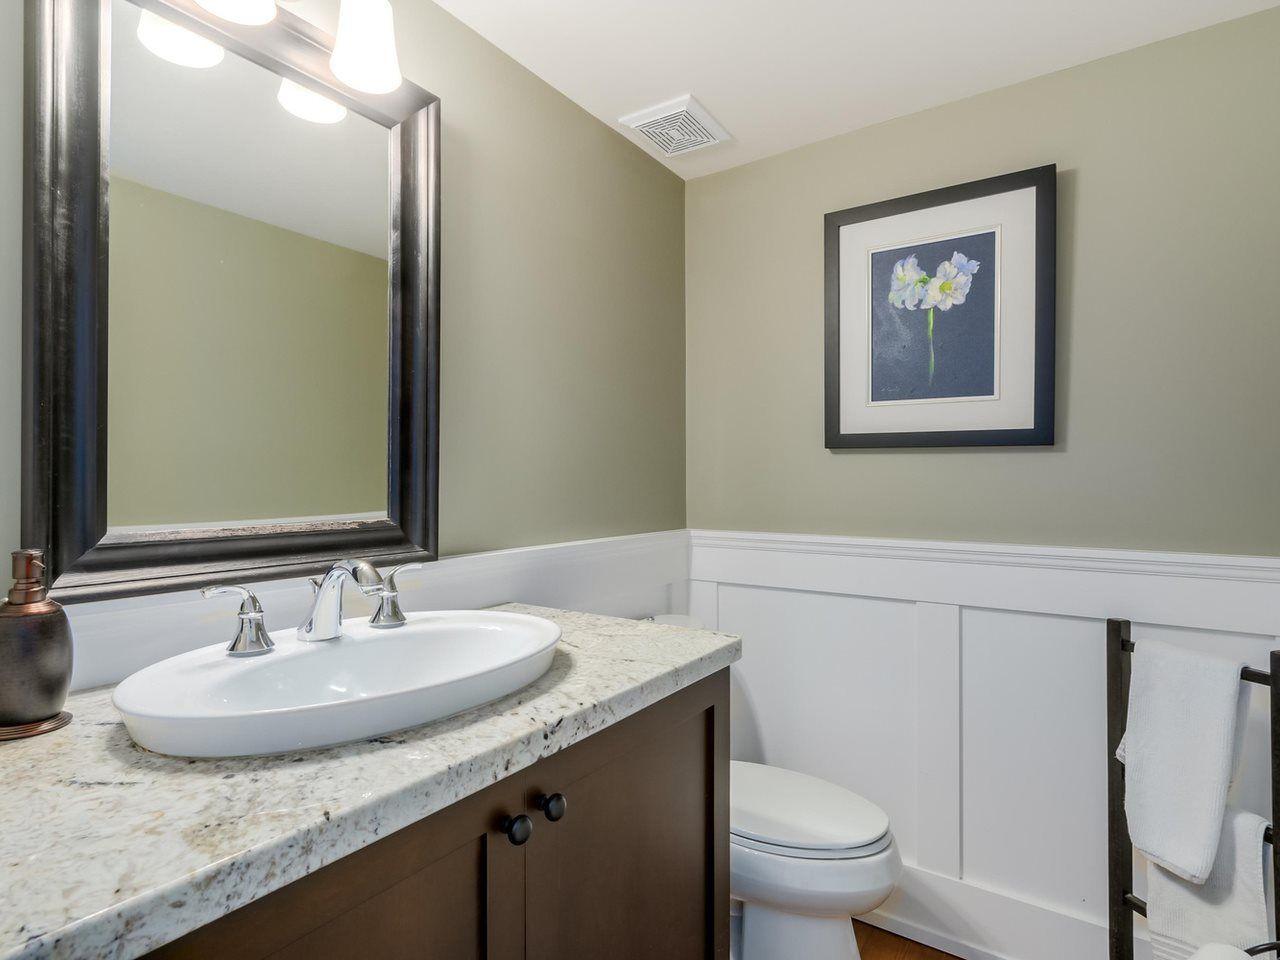 Photo 10: Photos: 13029 14 Avenue in Surrey: Crescent Bch Ocean Pk. House for sale (South Surrey White Rock)  : MLS®# R2070160